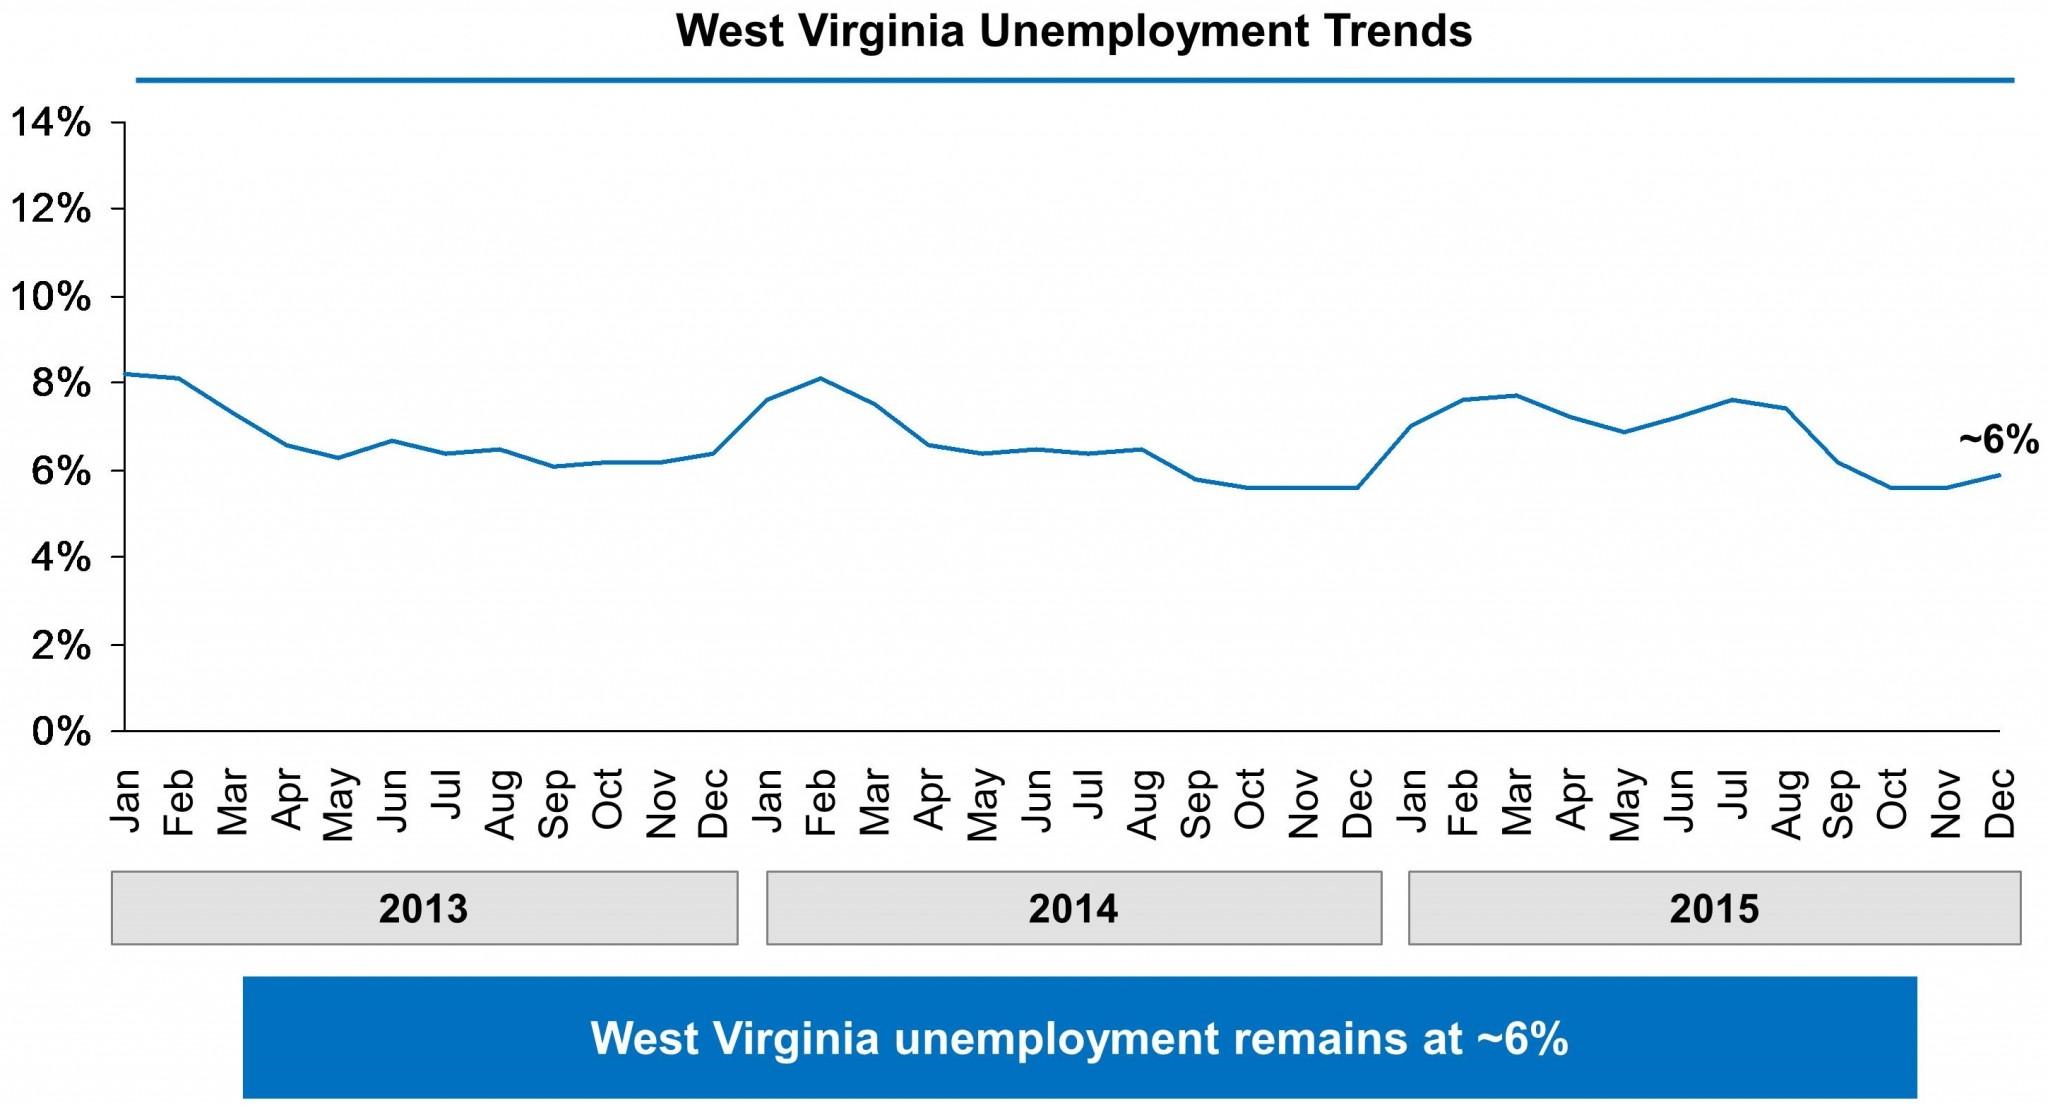 West Virginia EB-5 Regional Center - Set Up New or Rent